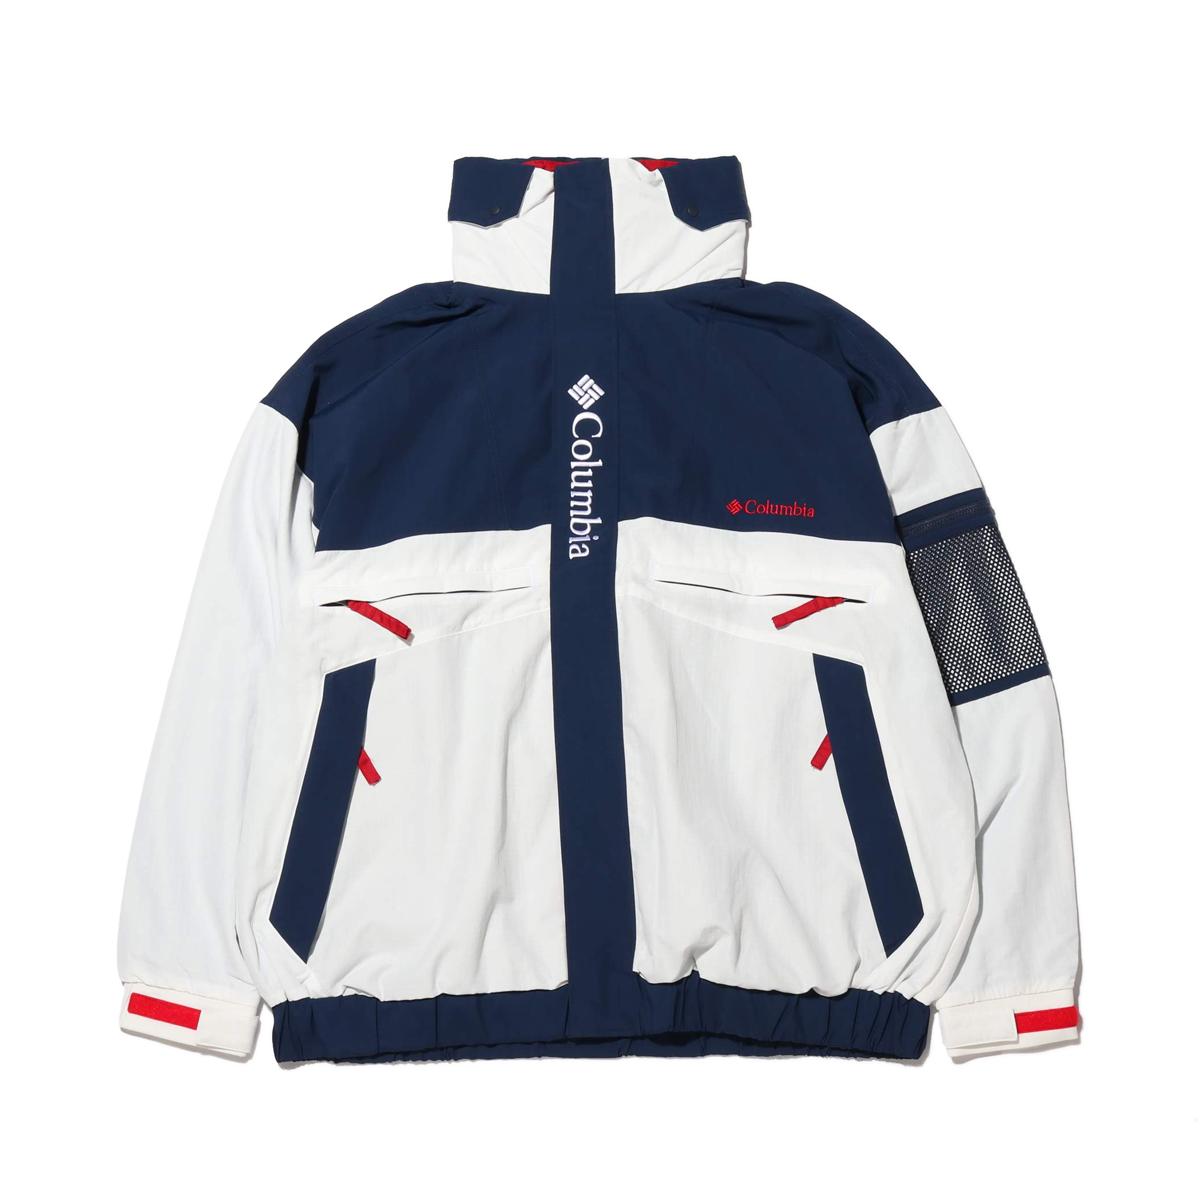 Columbia Wolf Road™ Jacket(Sea Salt)(コロンビア ウルフロード™ ジャケット)【メンズ】【ジャケット】【20SS-I】